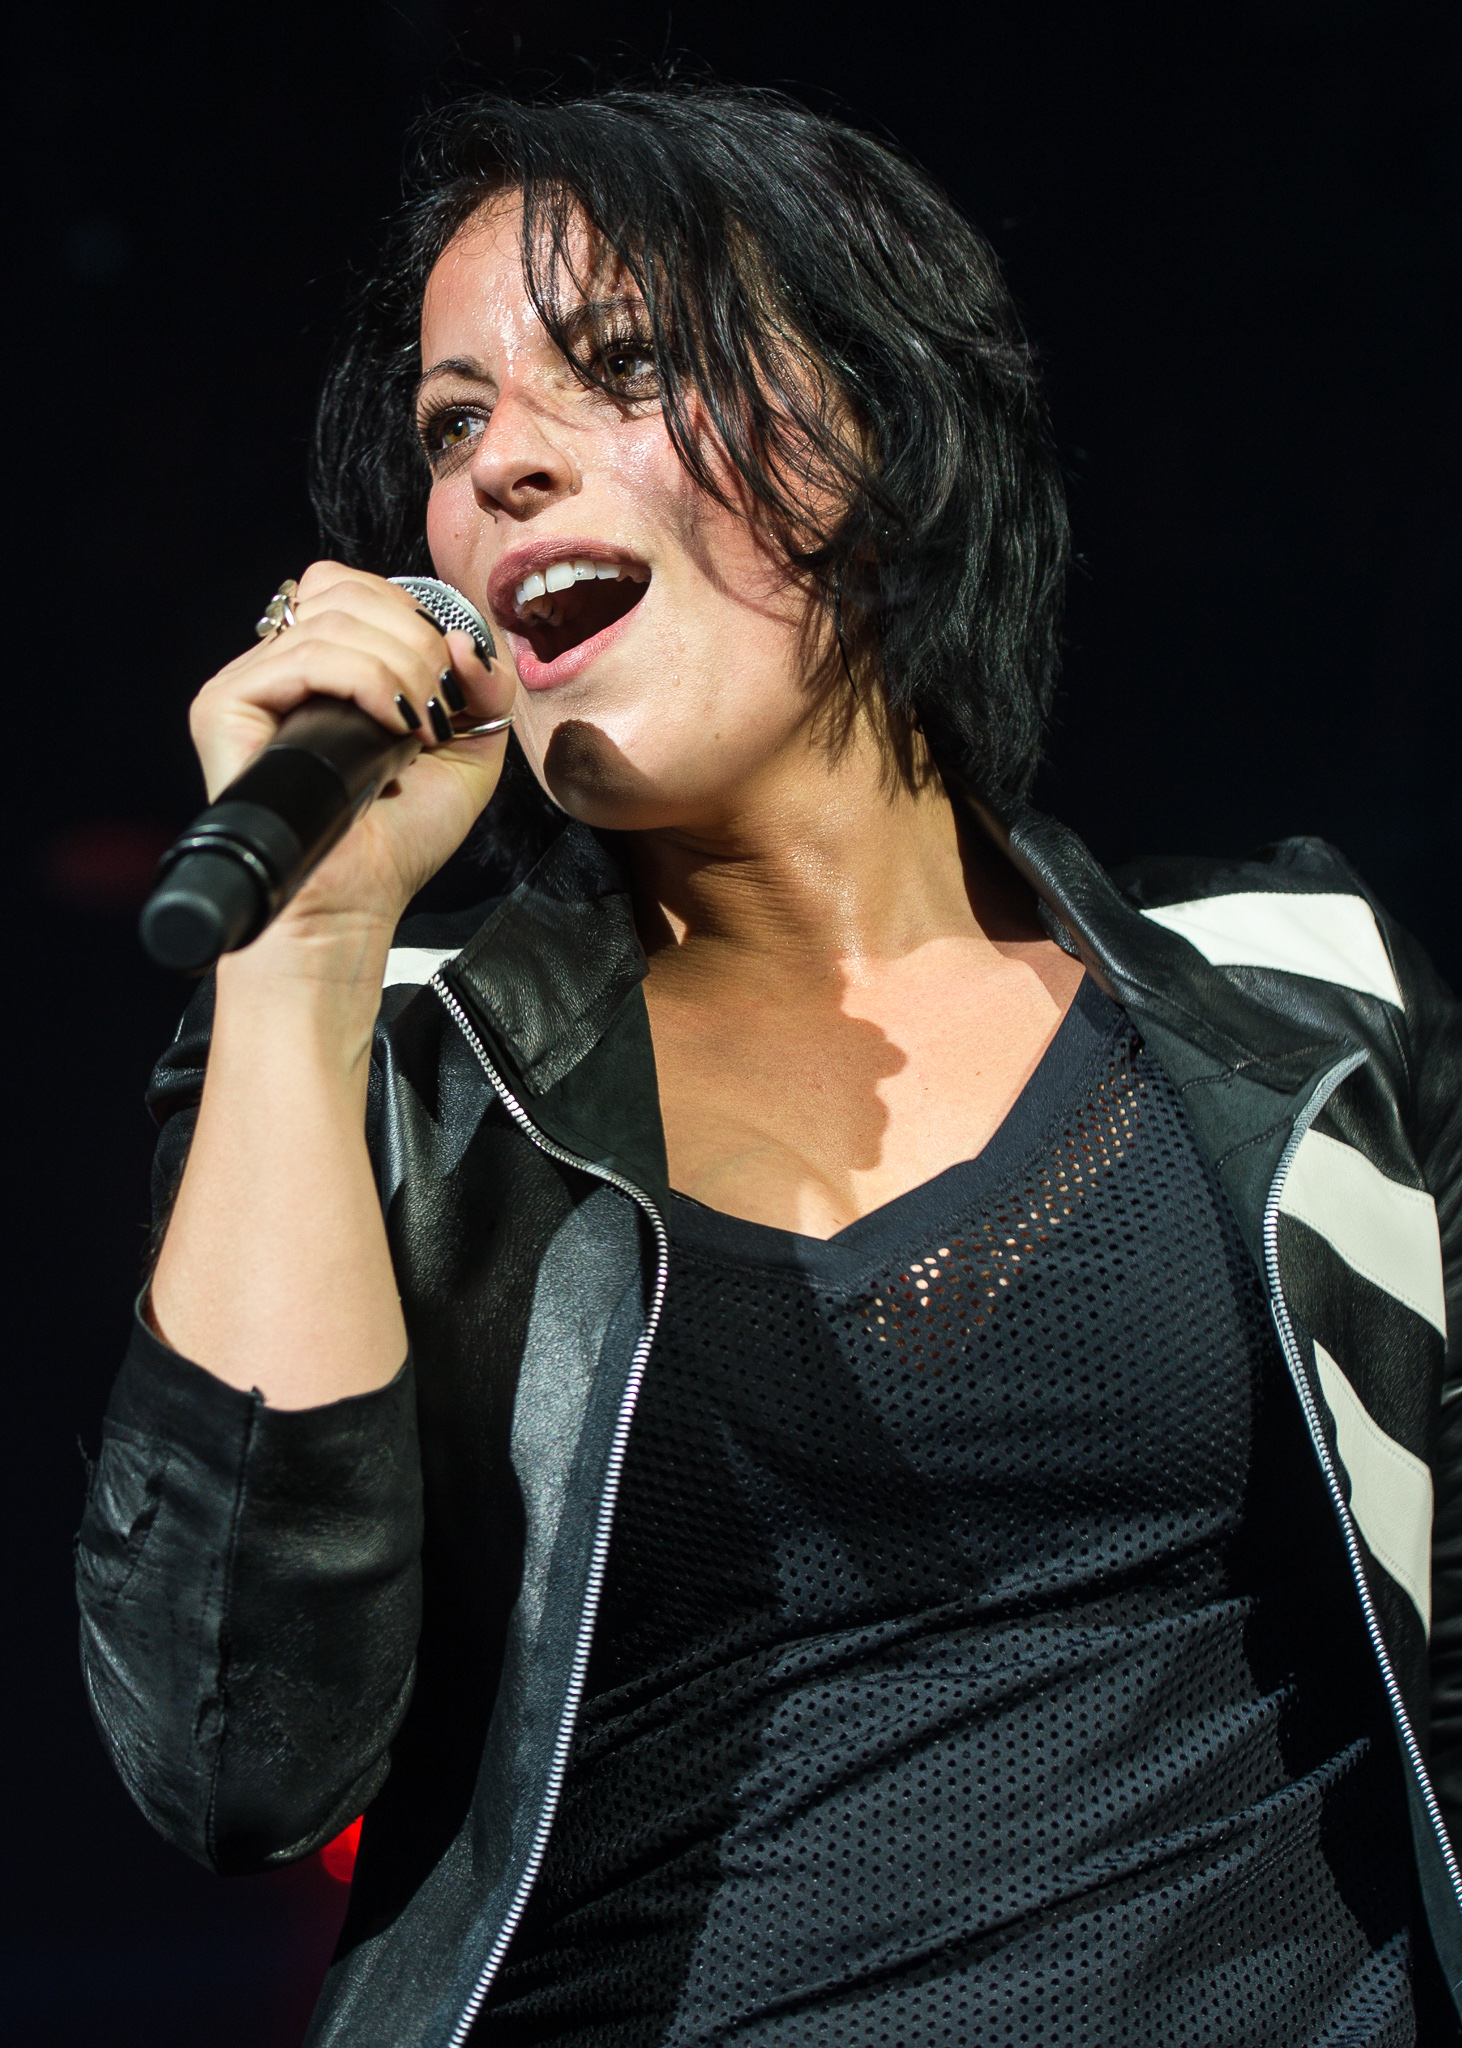 Stefanie Kloß Wikipedia